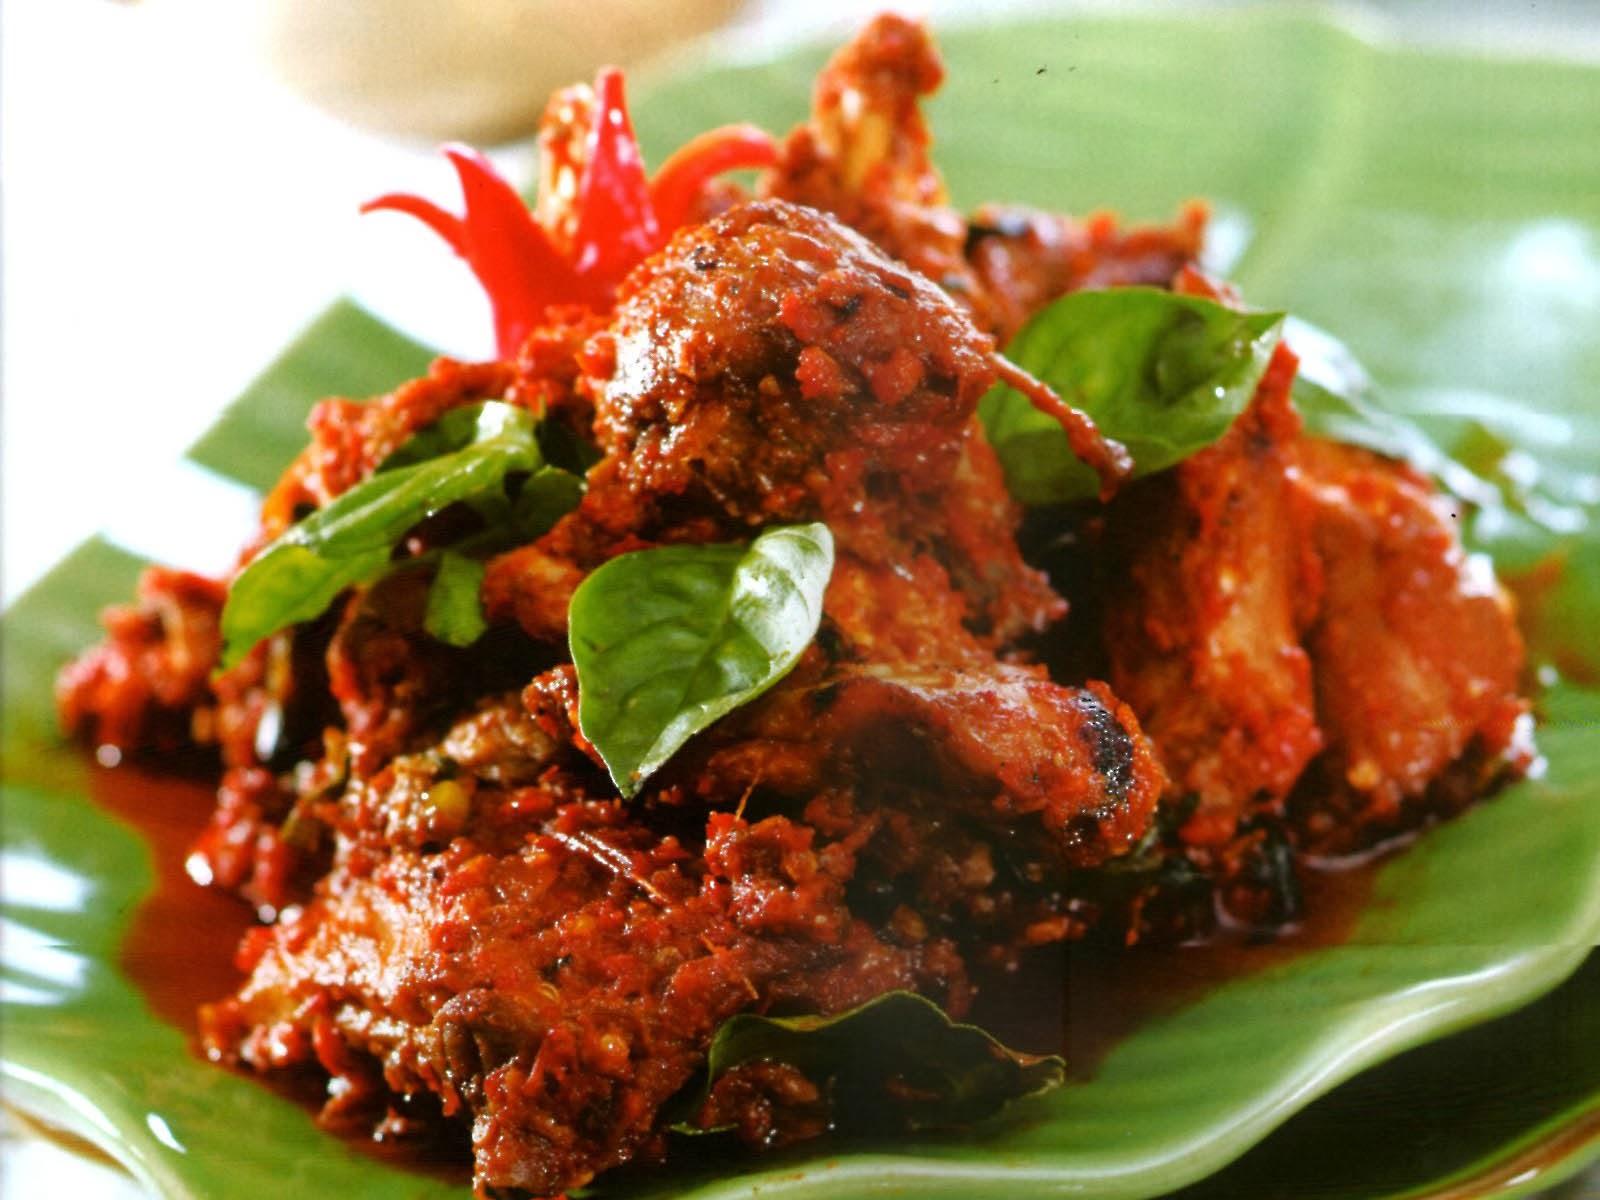 Resep Masakan Sambal Hati Ampela